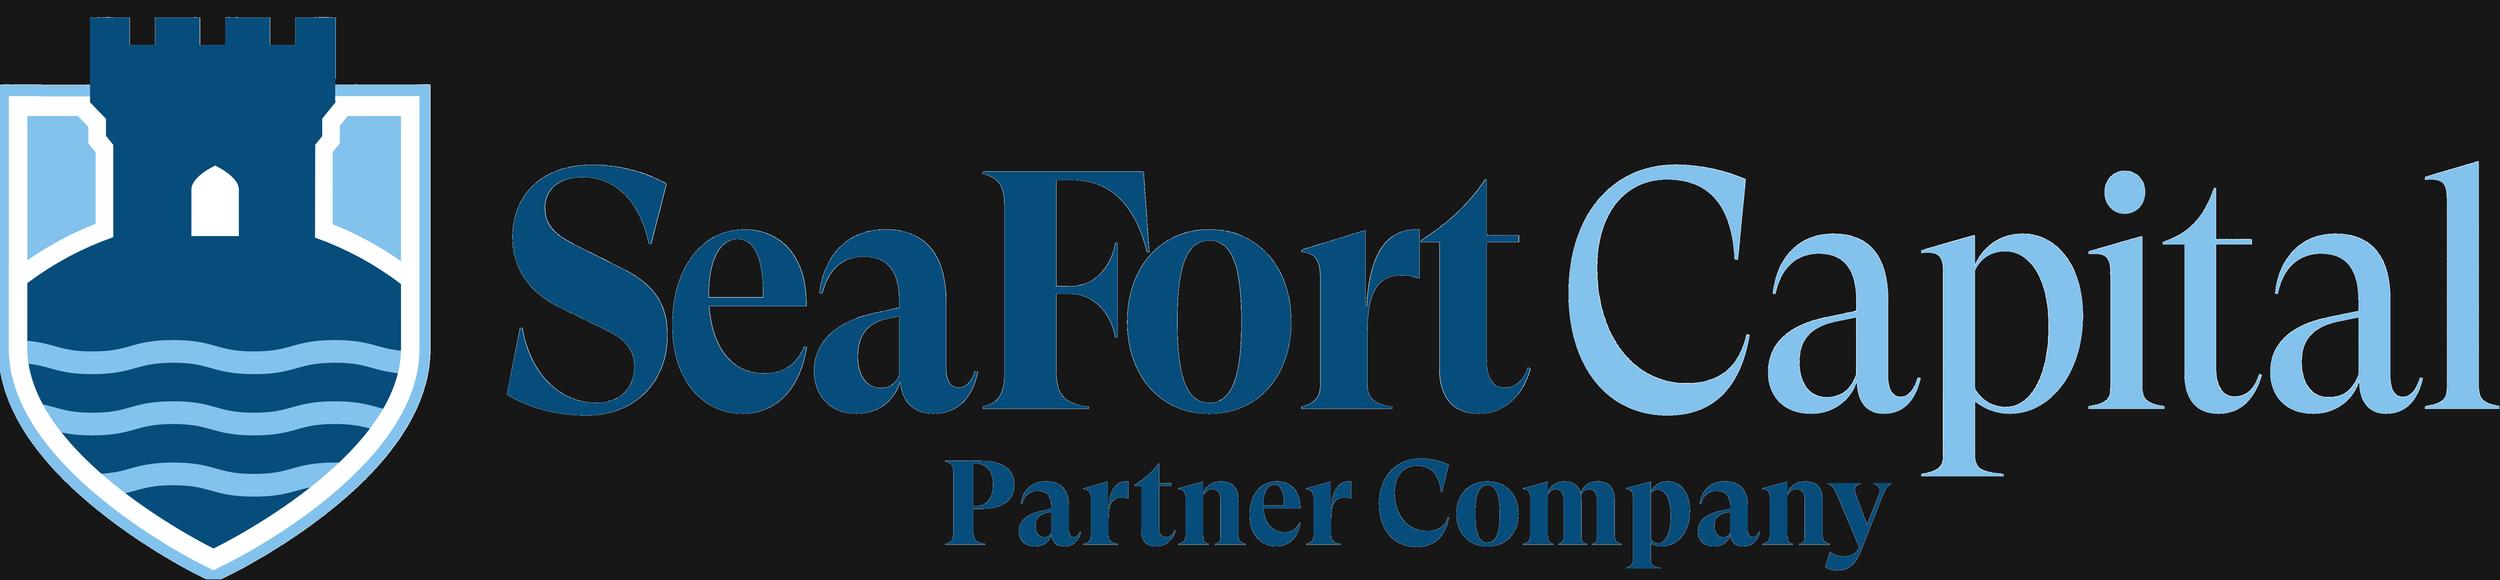 SeaFort Capital Partner Company